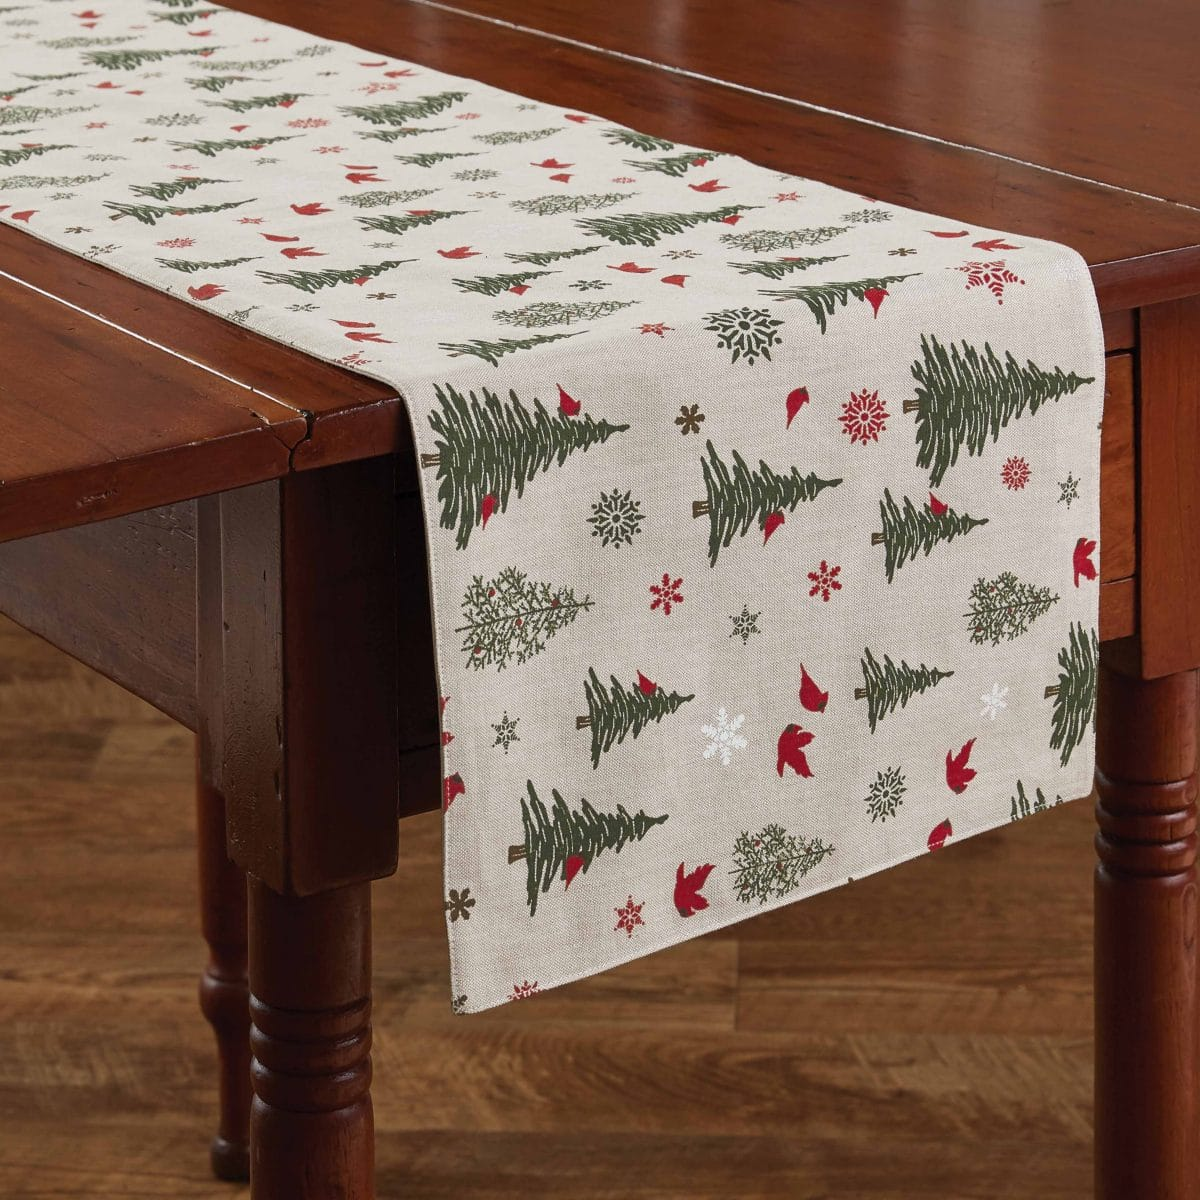 Christmas Table Runner To Make.Christmas Table Runner Maine Adult Education